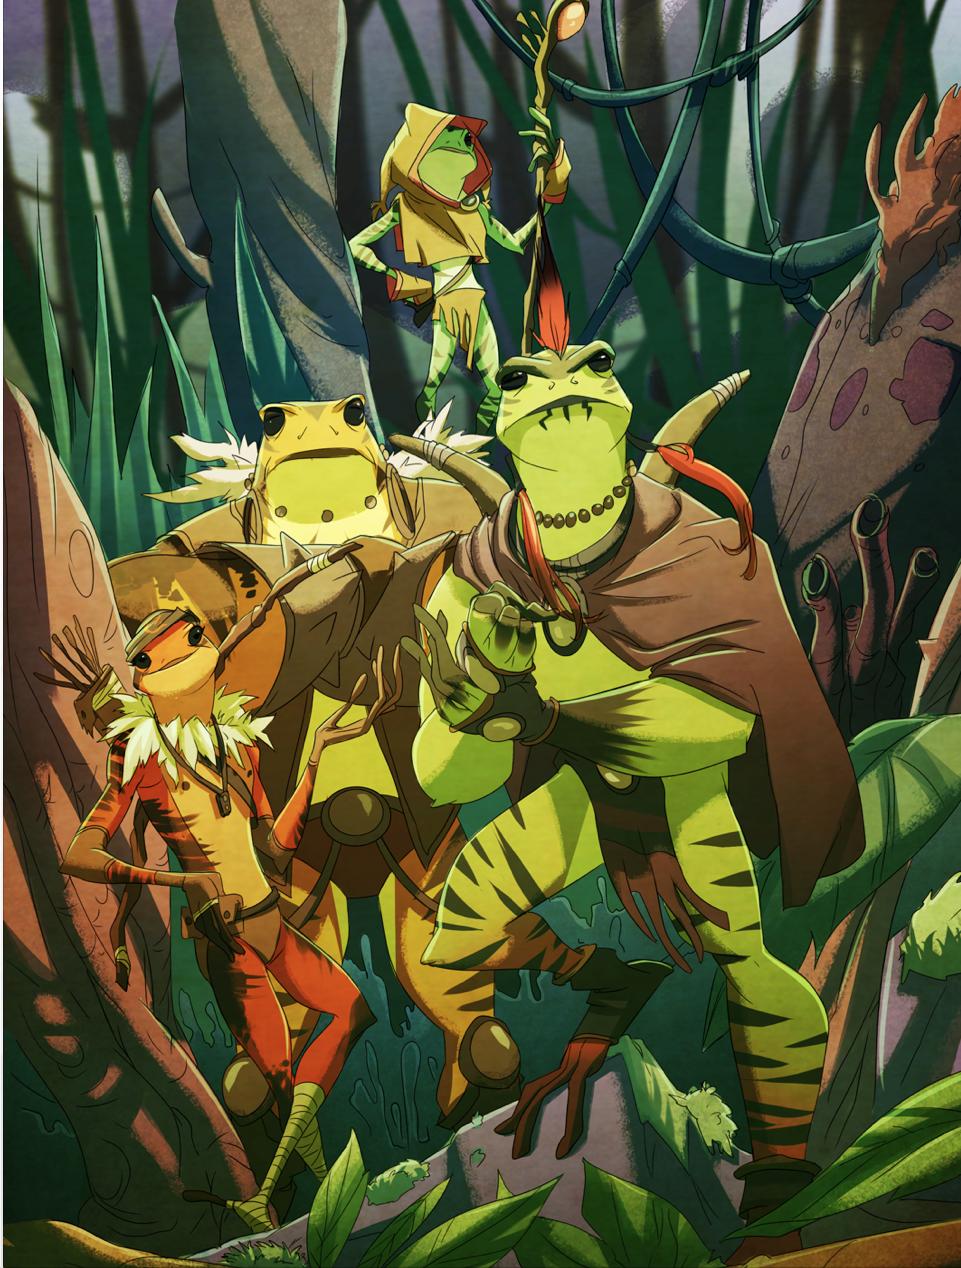 Amy of Frogs: The Kulipari by greenestreet